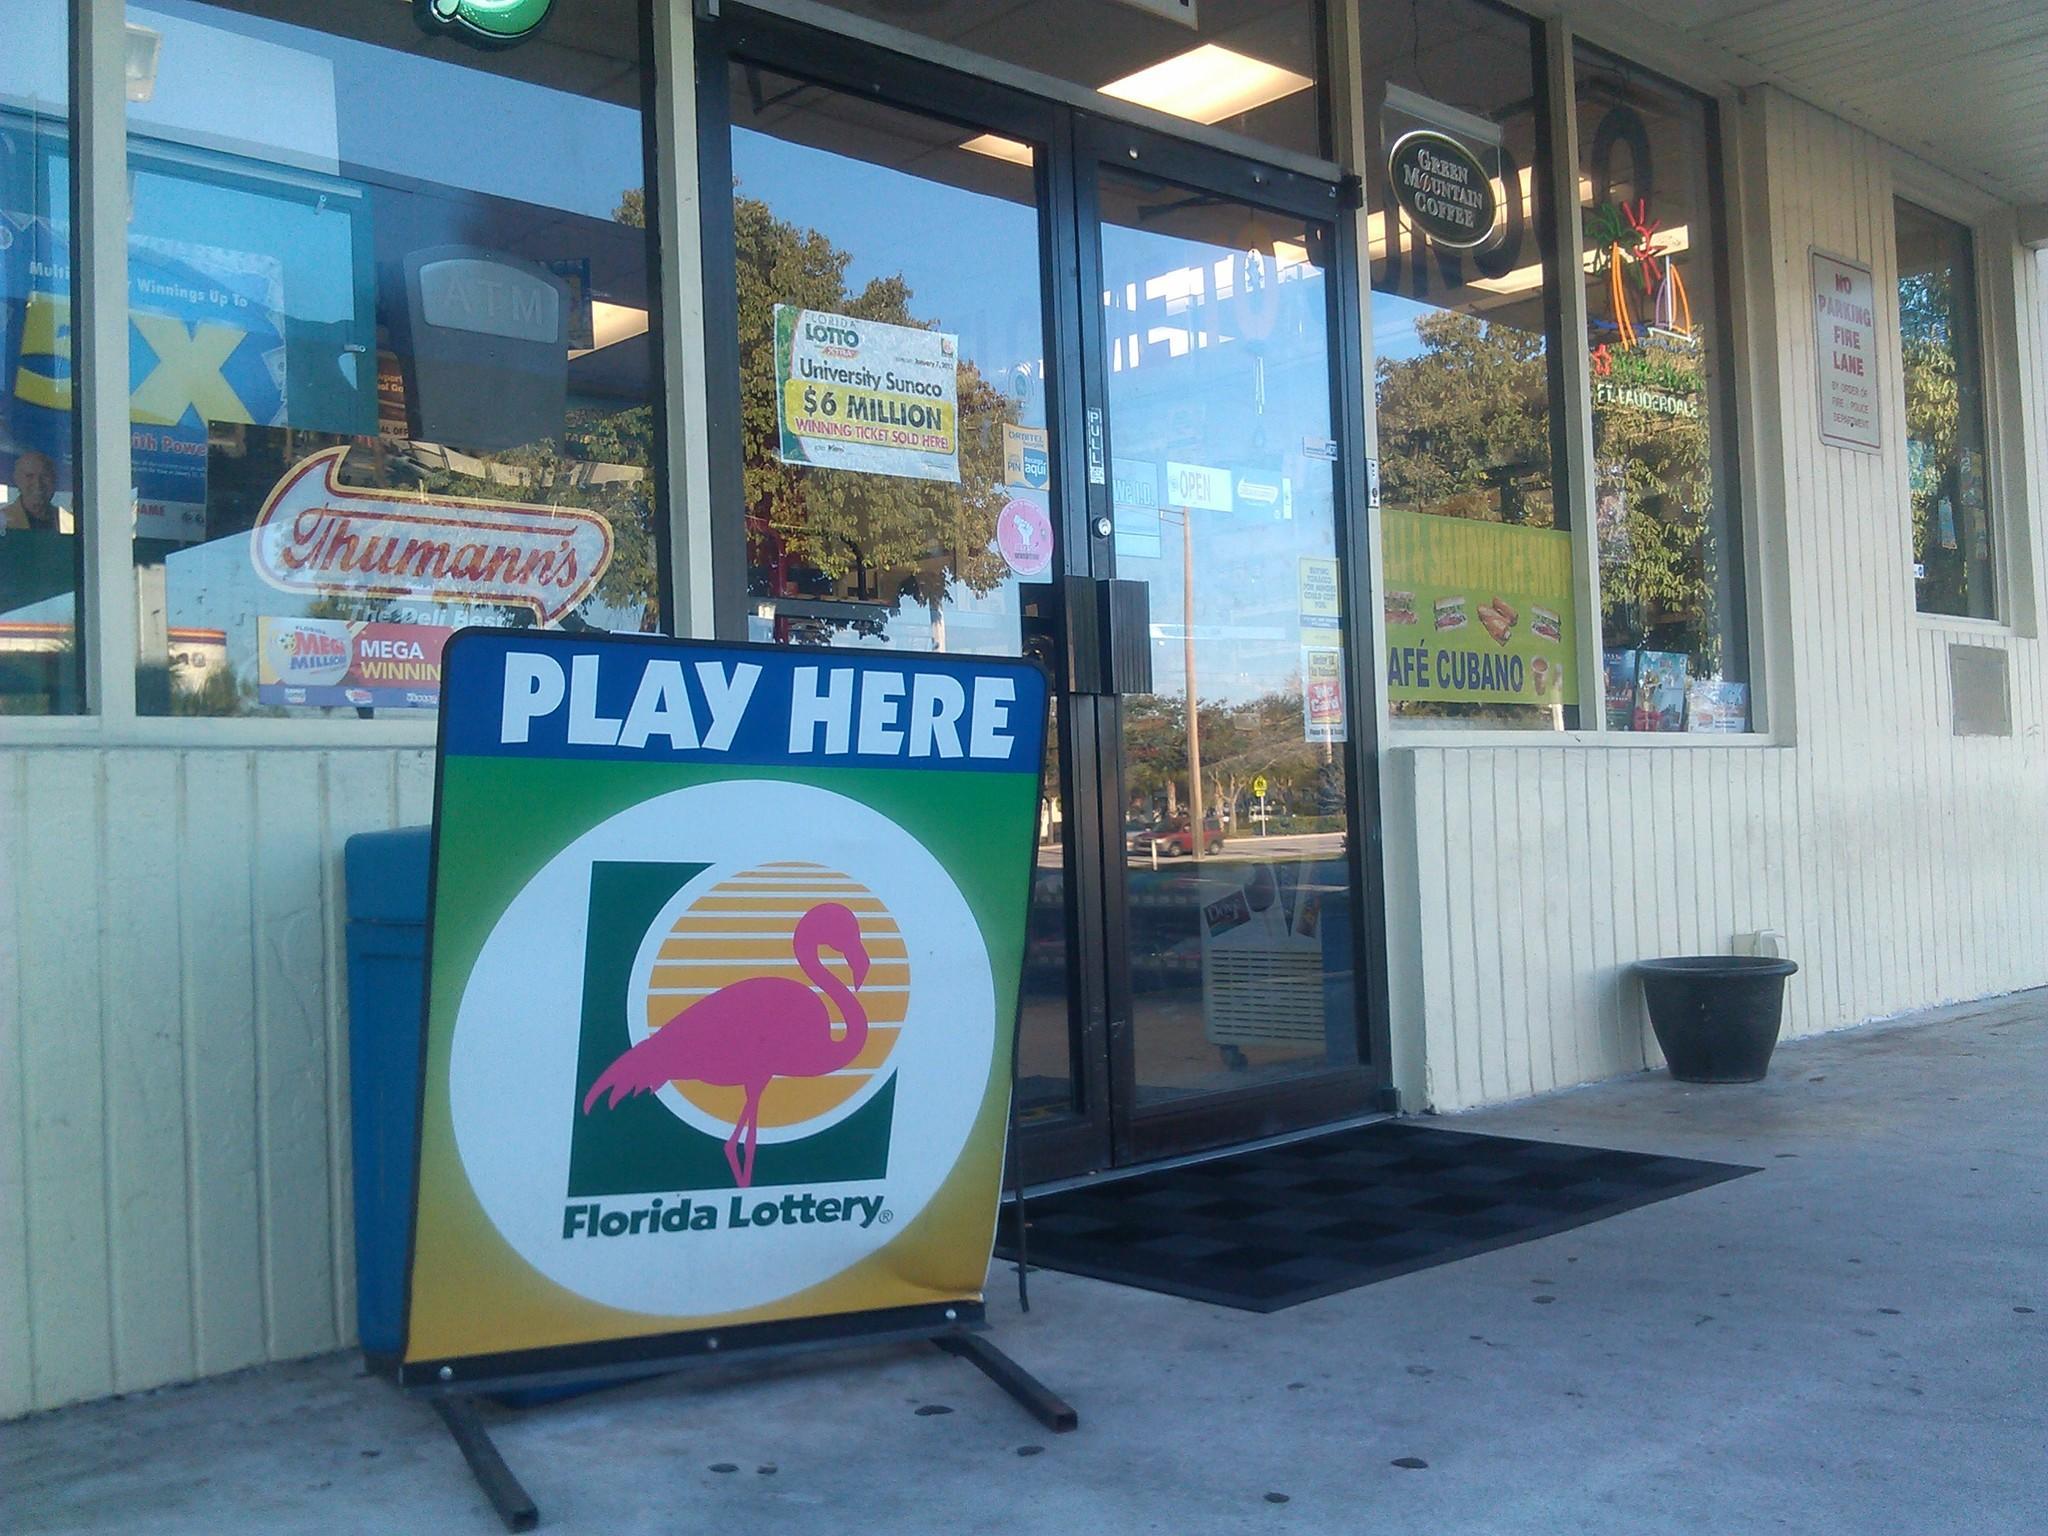 Vic's Sunoco at 8291 N. University Drive in Tamarac sold the $12 million winning Lotto ticket.